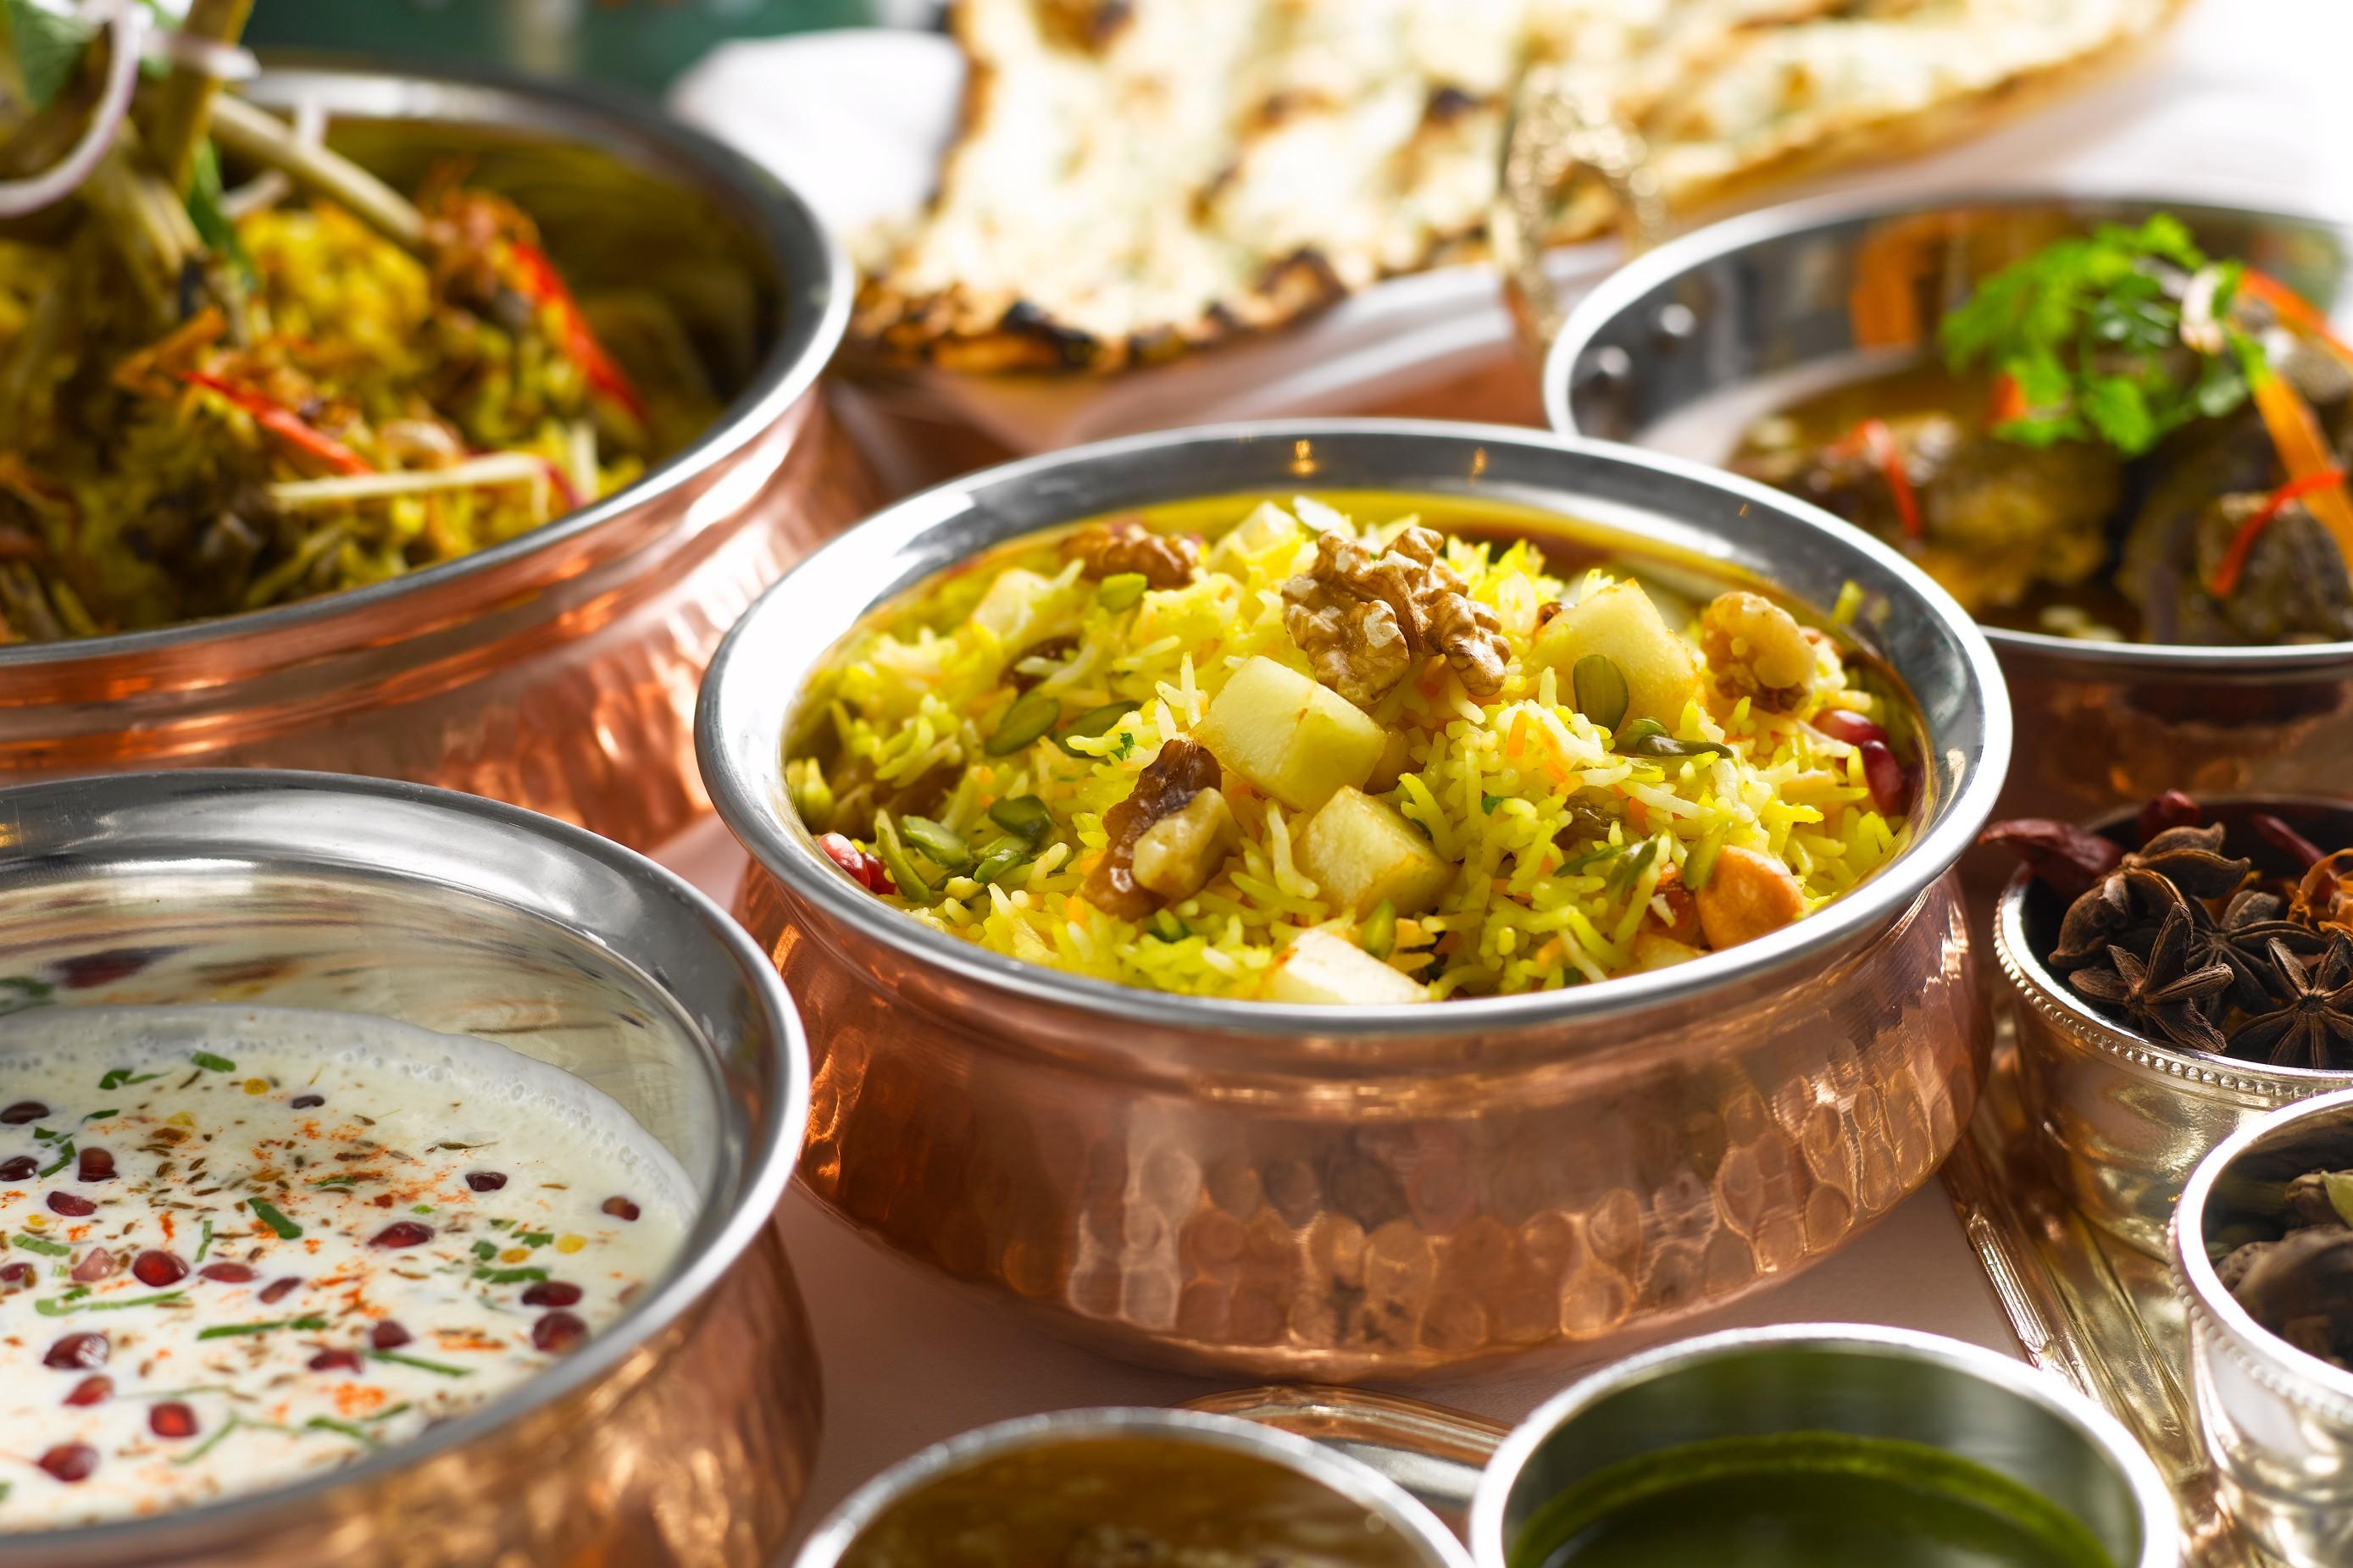 5 restaurants to break fast and celebrate Hari Raya Puasa